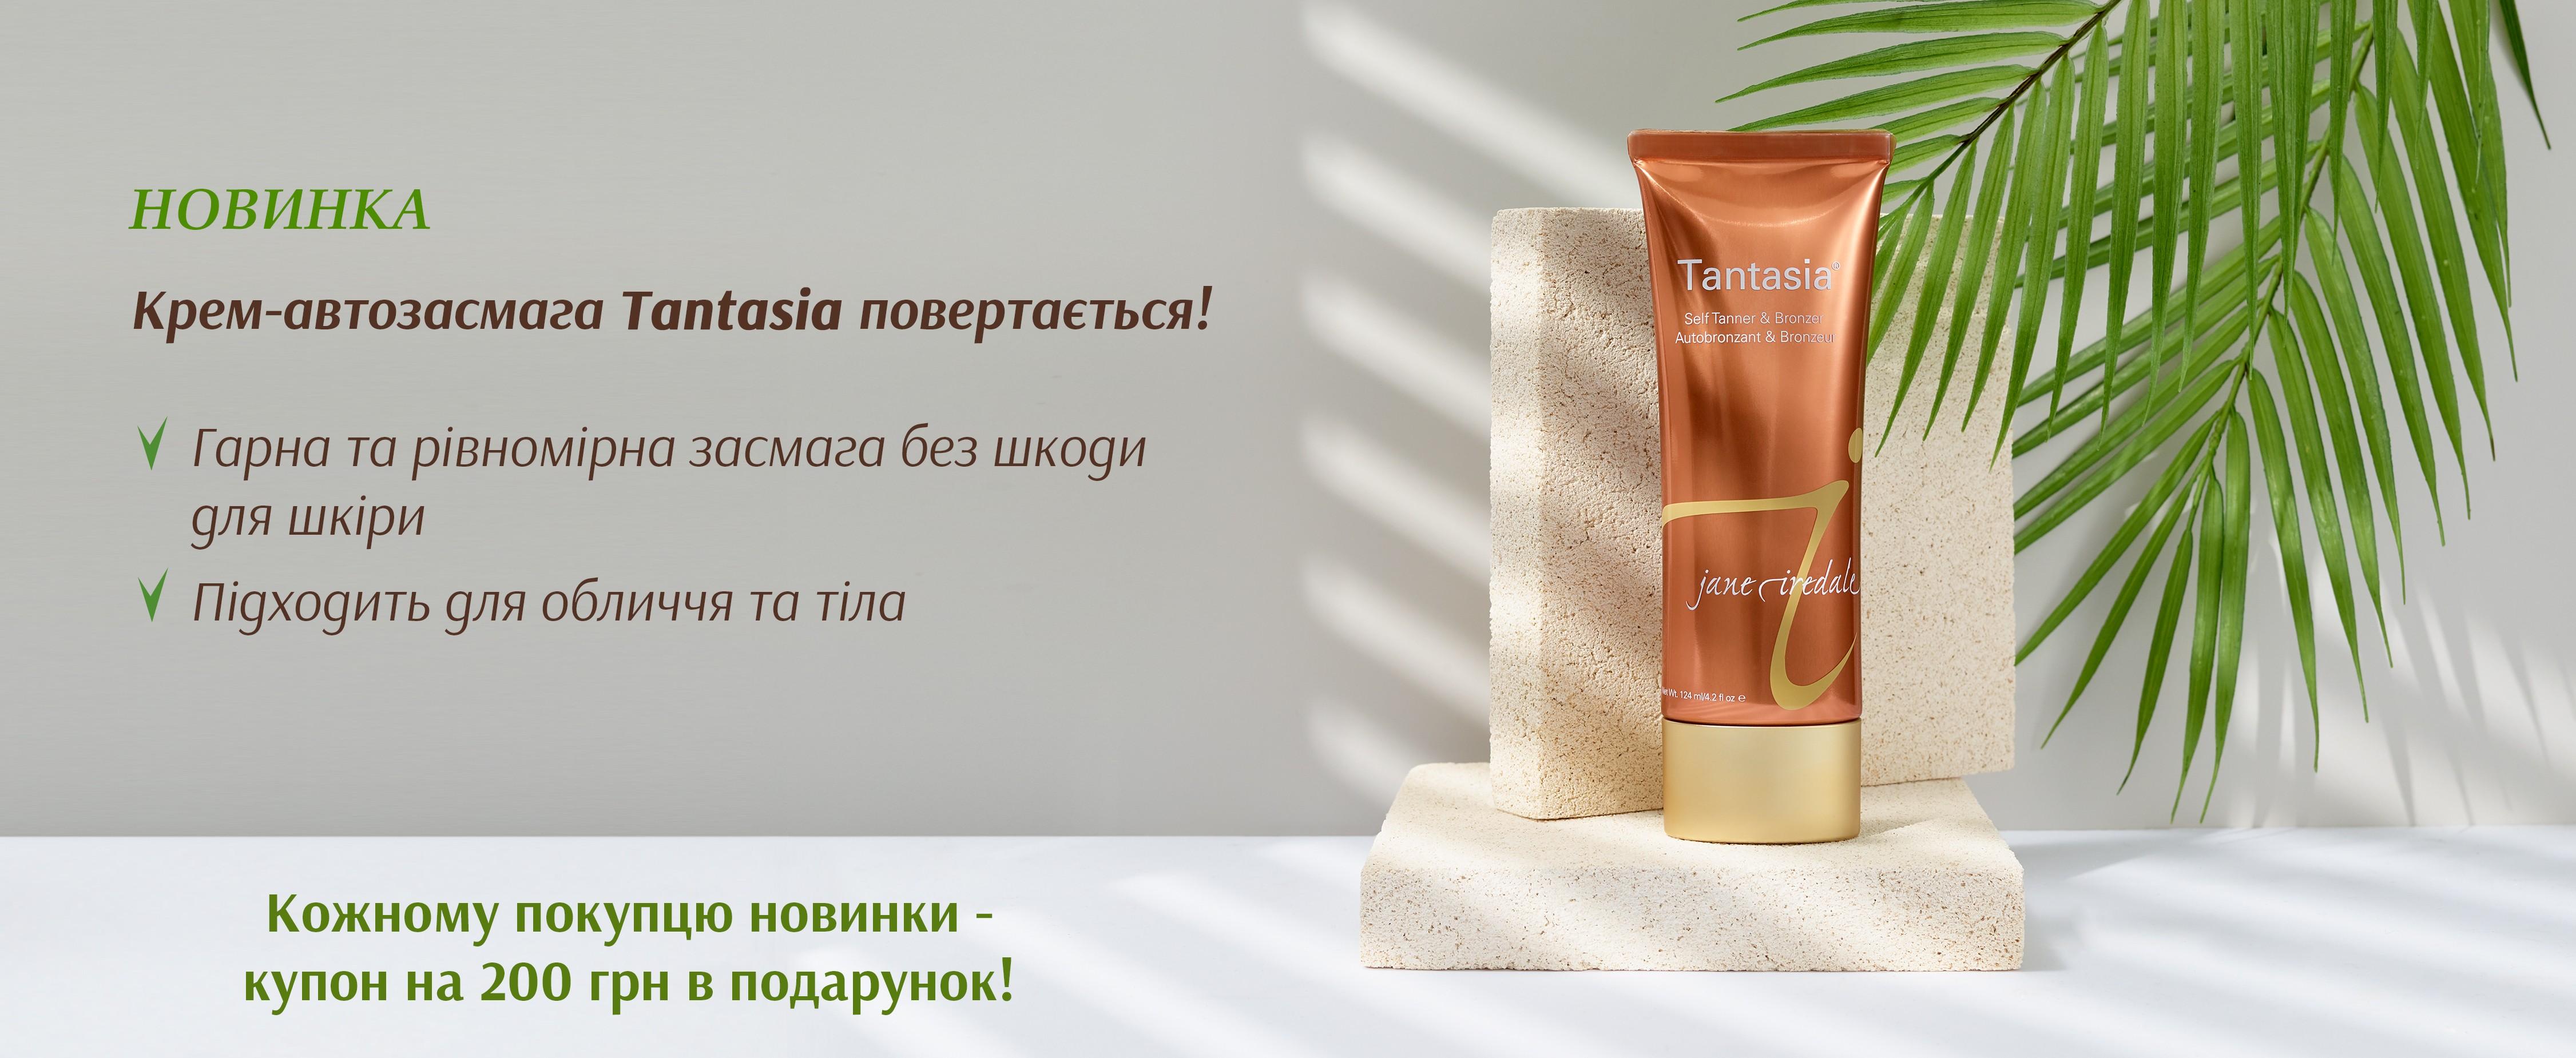 Новинка крем-автозасмага Tantasia